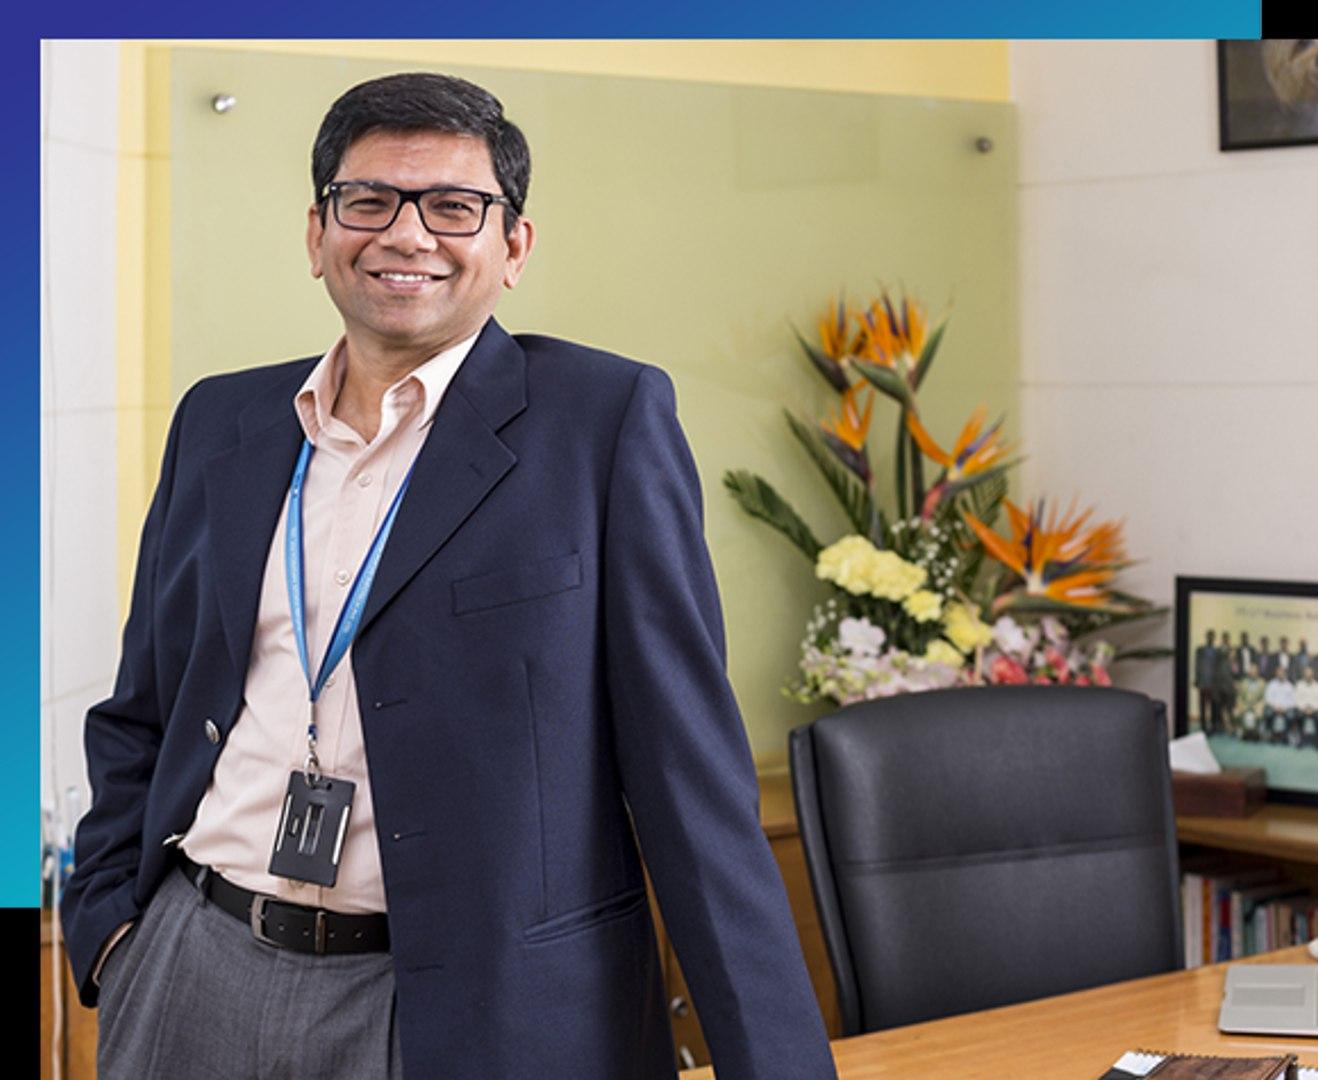 Veerendra Mathur  Talk About Future Focus Inspiring Ideologies